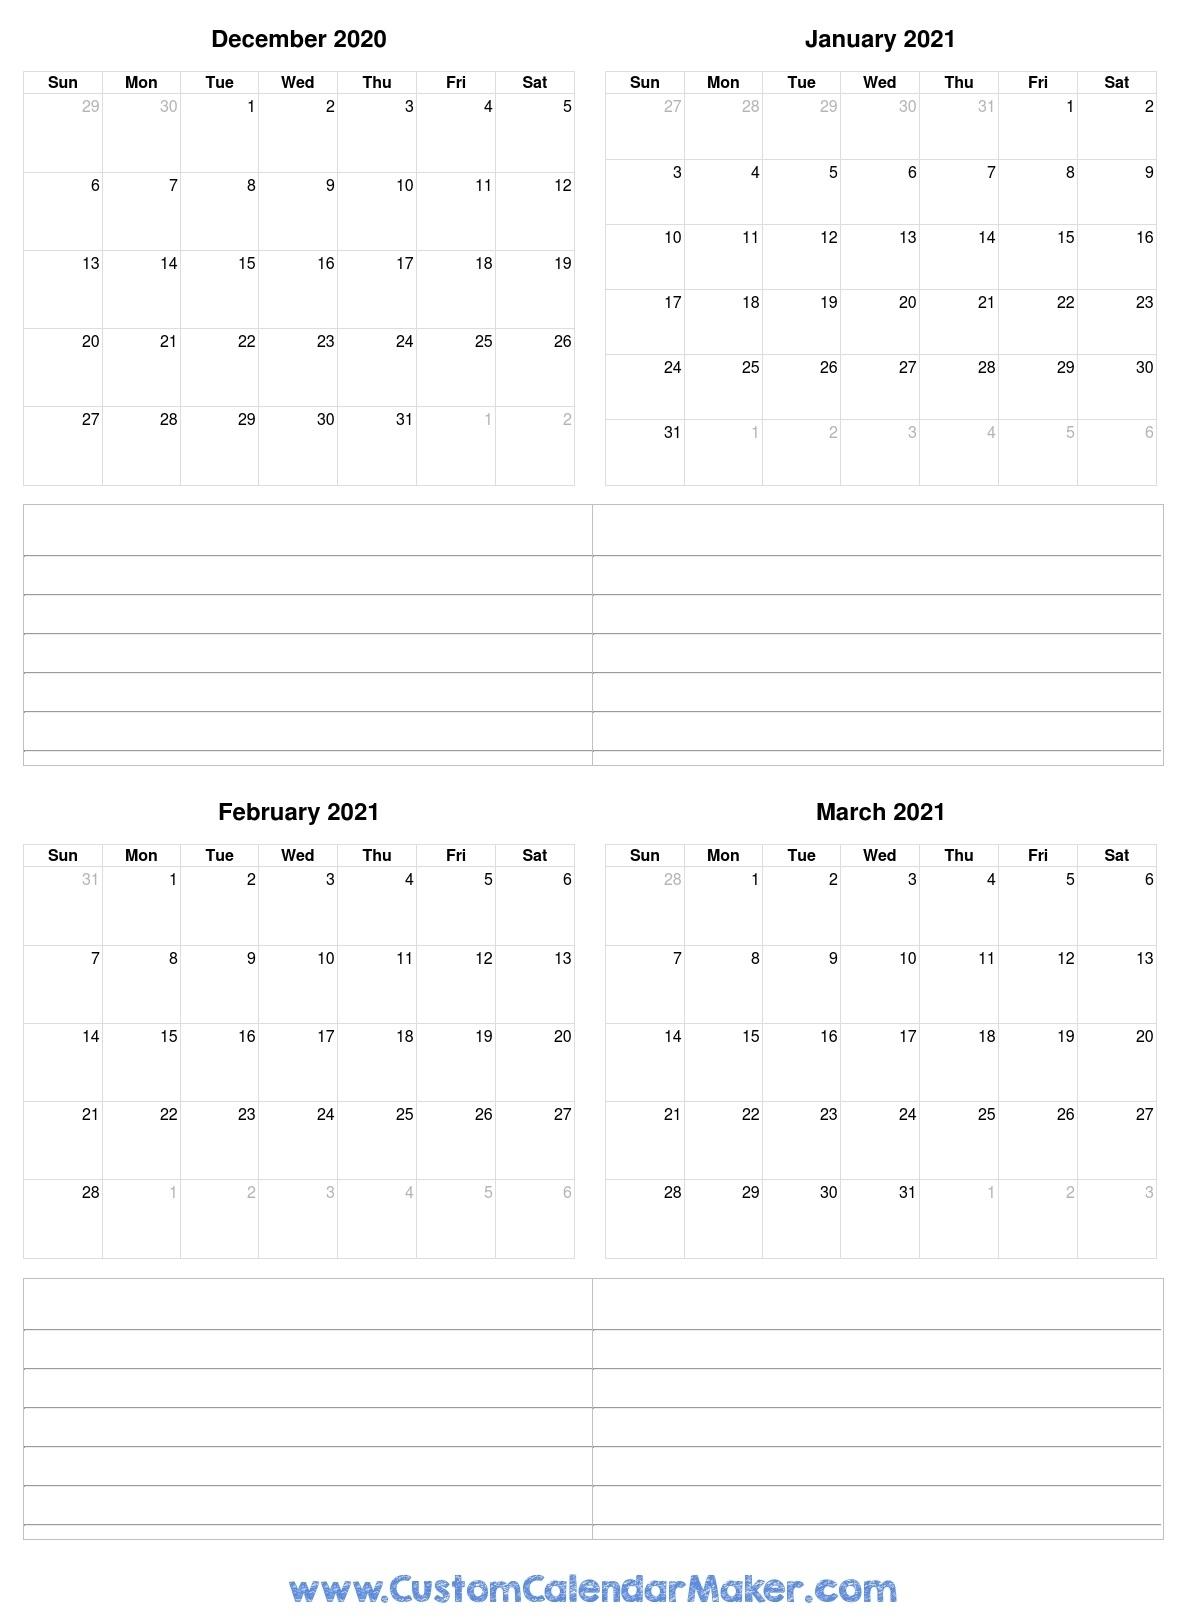 December 2020 To March 2021 Calendar